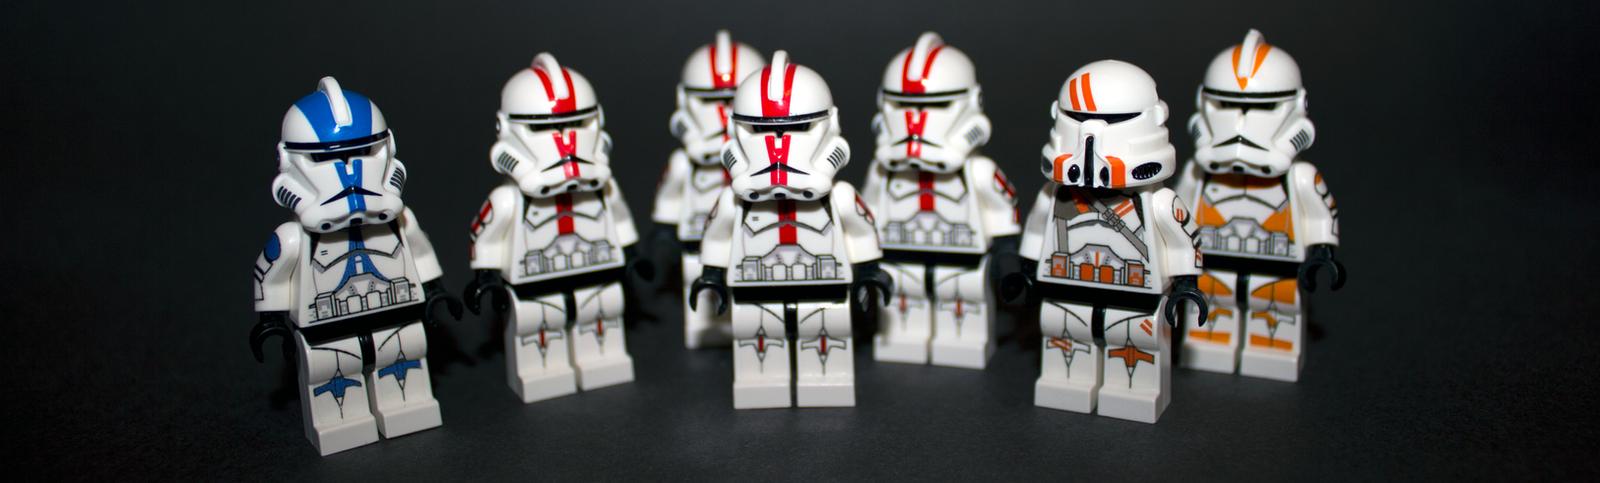 Clone Army by Riser38